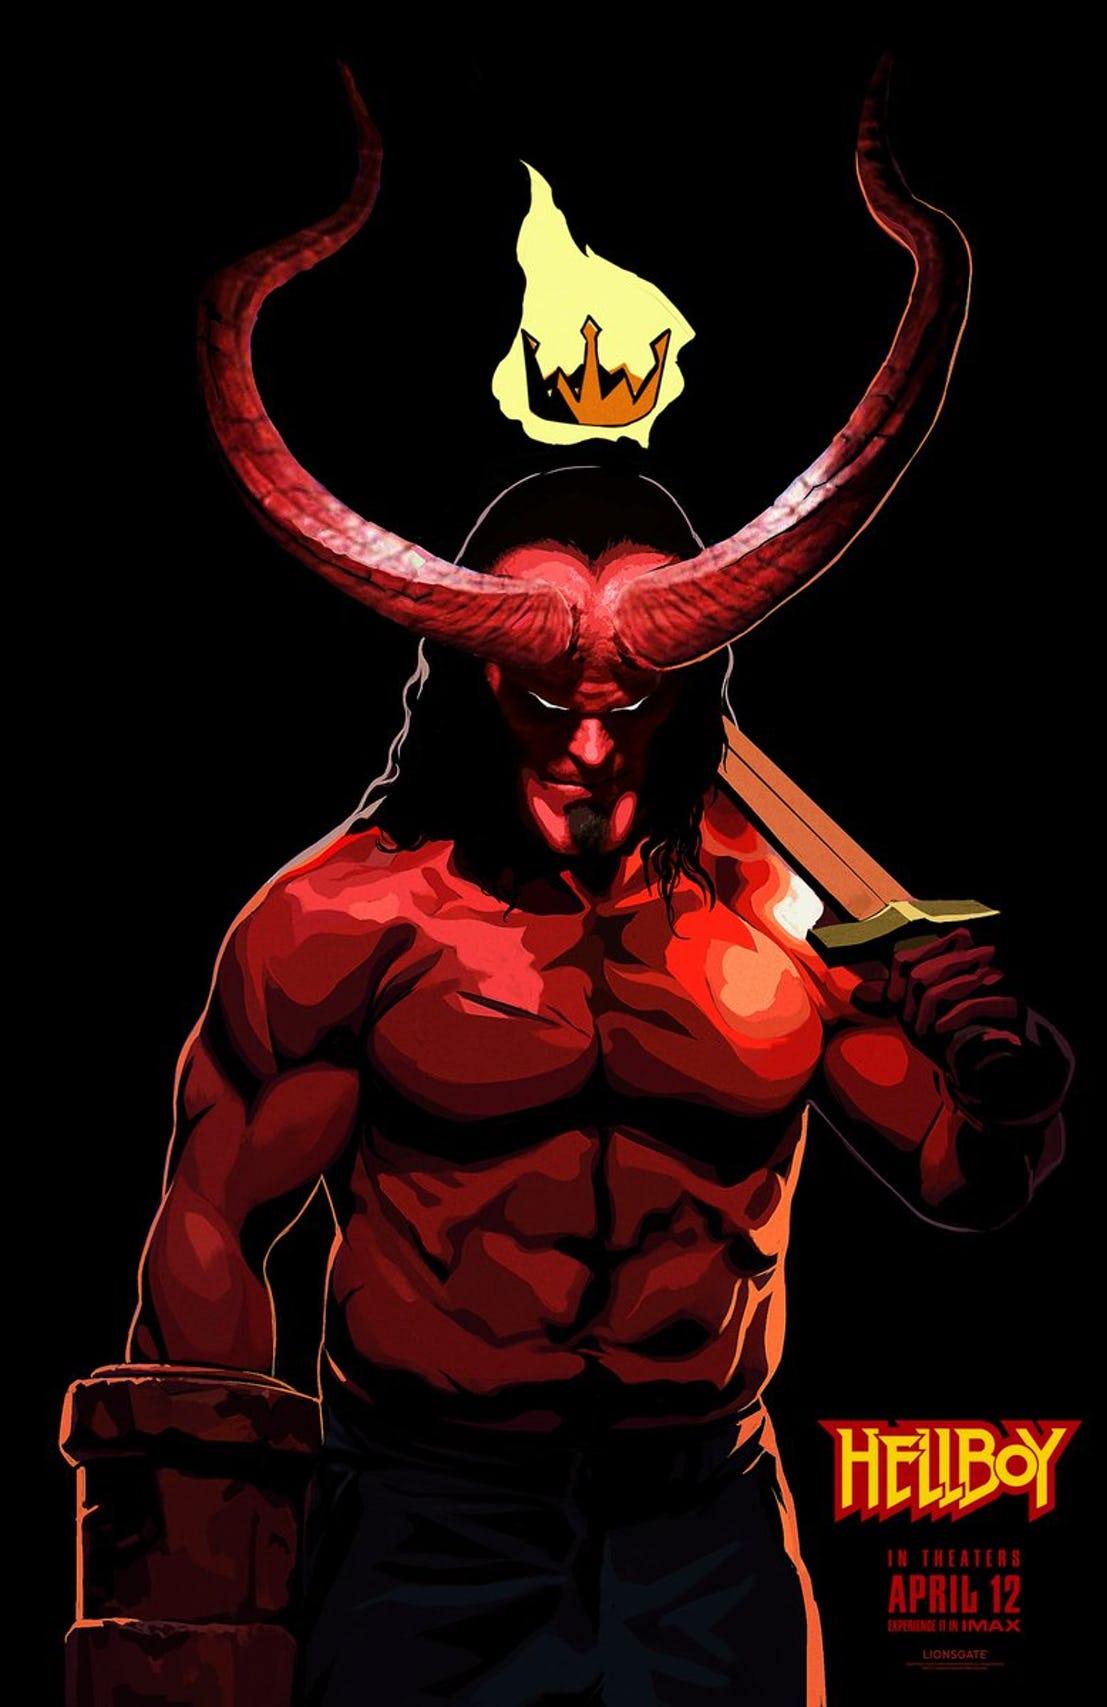 hellboy-poster3.jpg